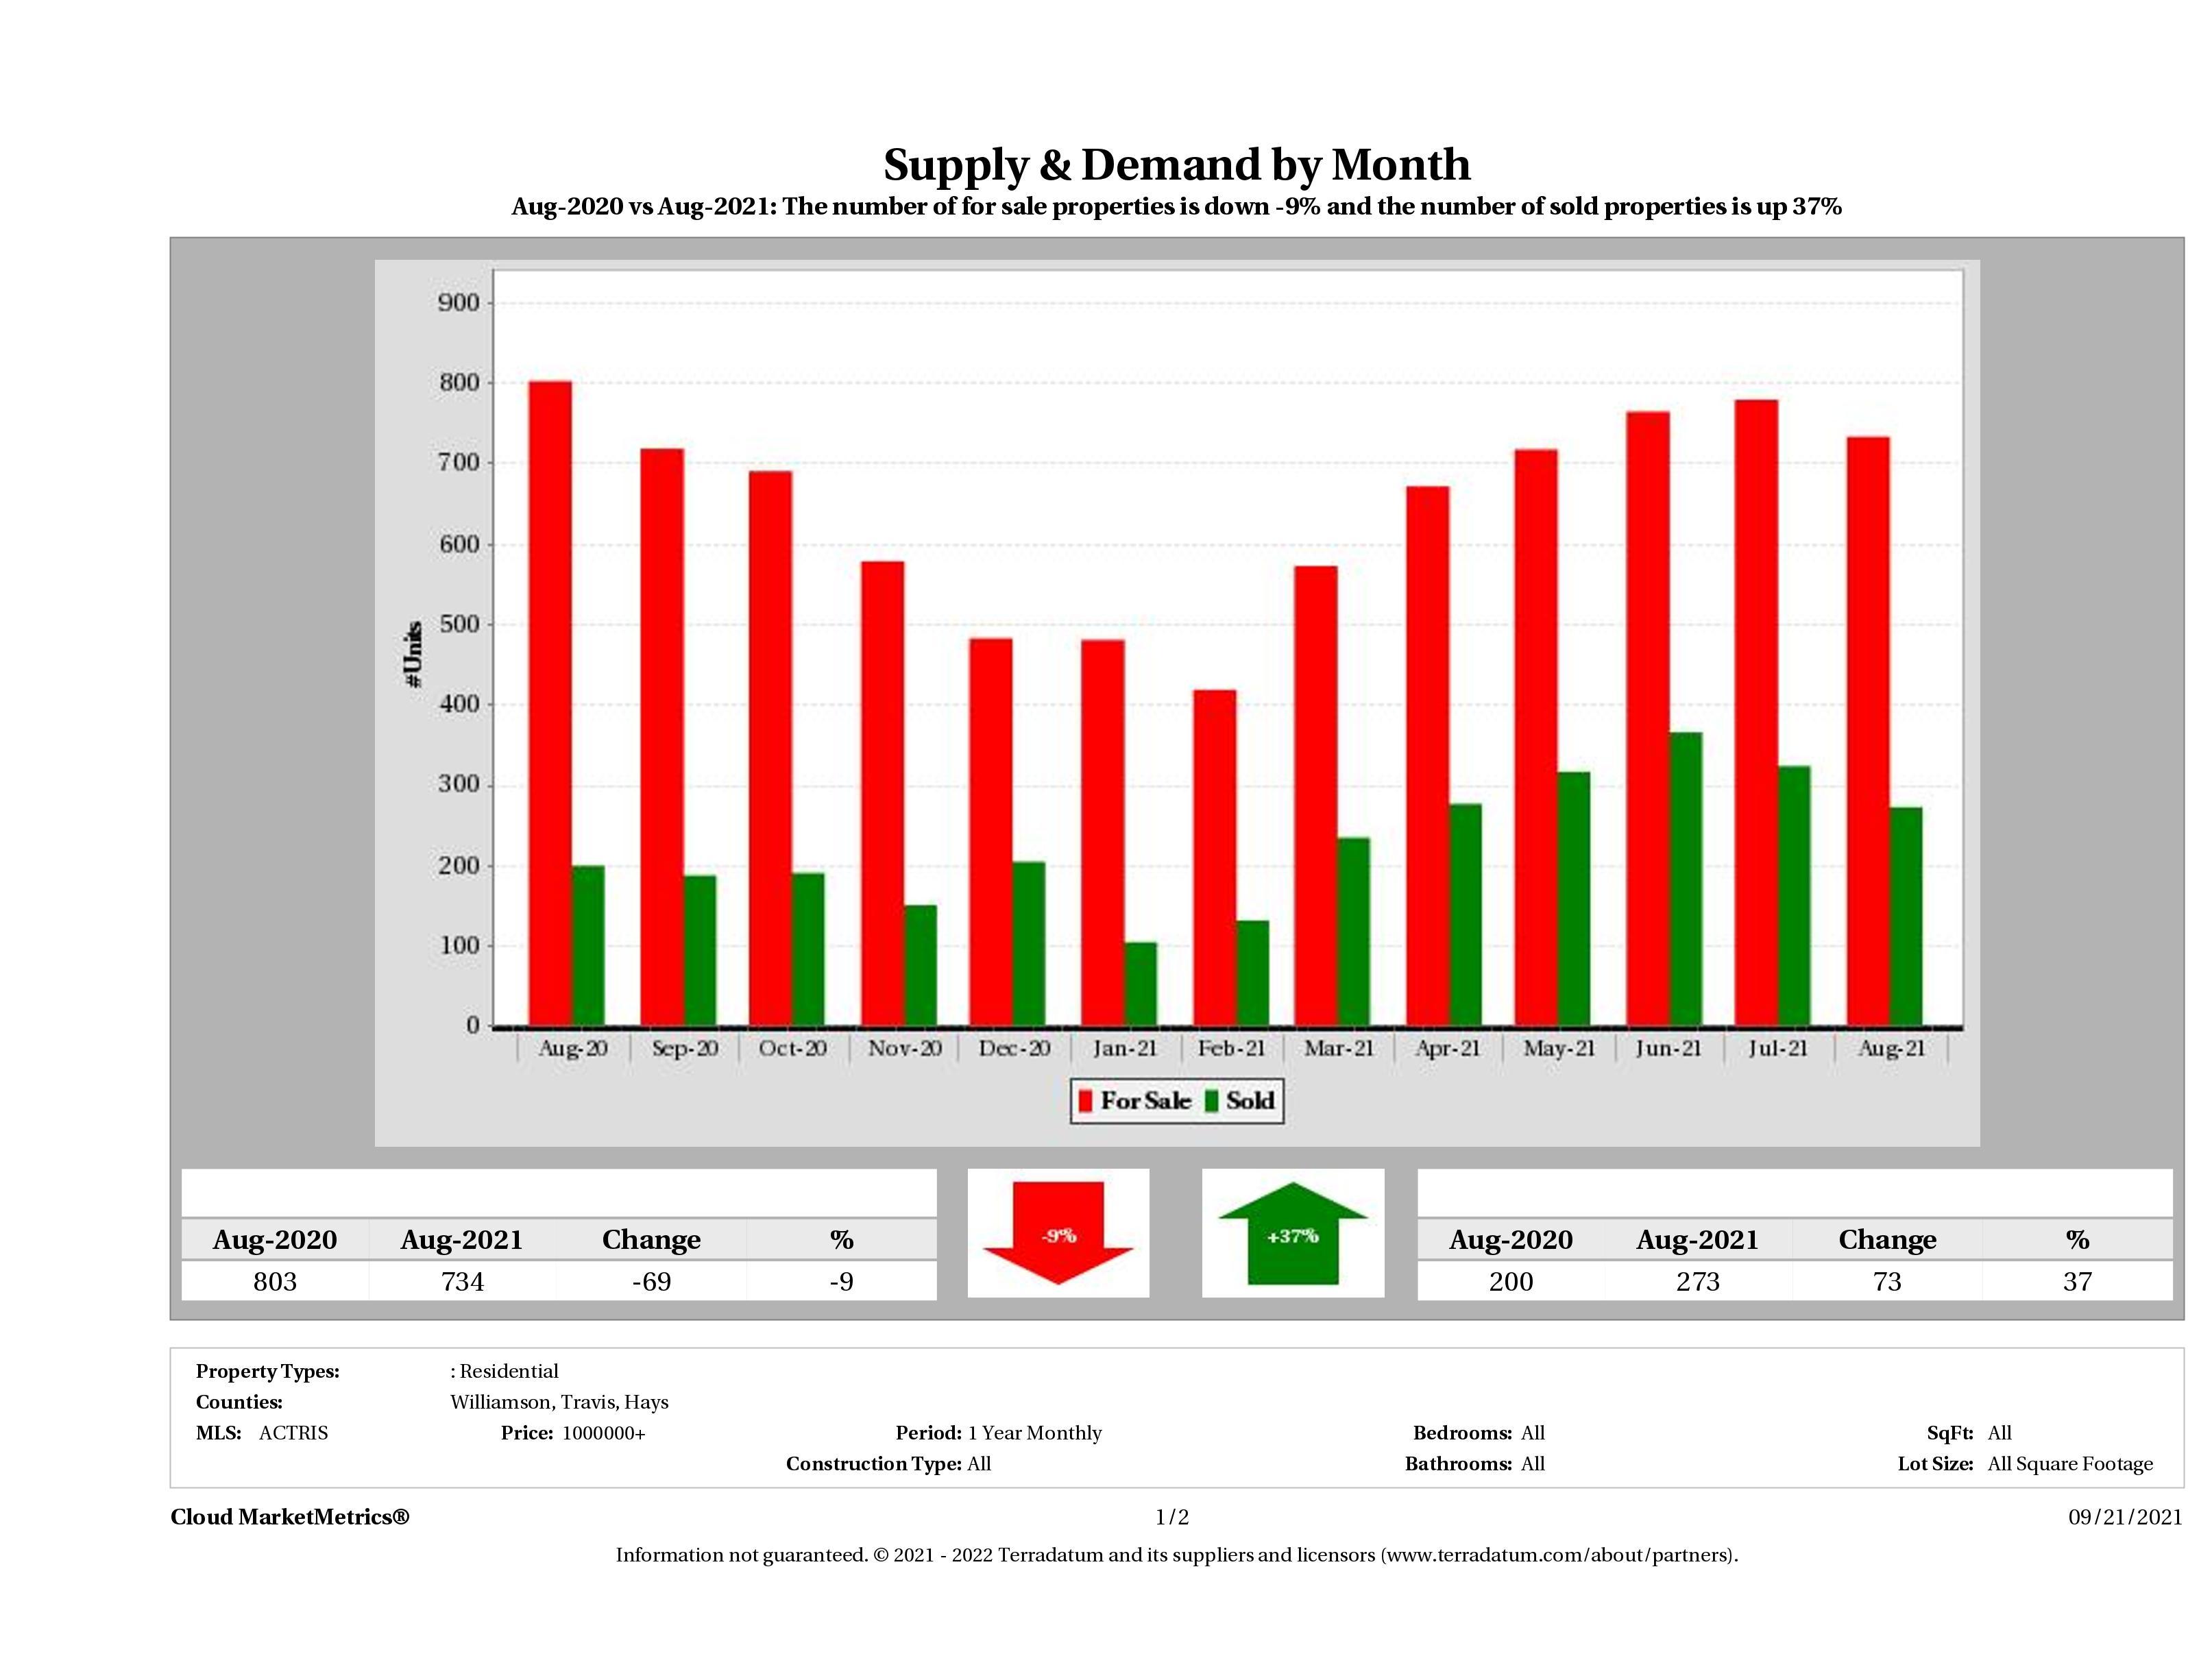 Austin luxury real estate market supply and demand August 2021